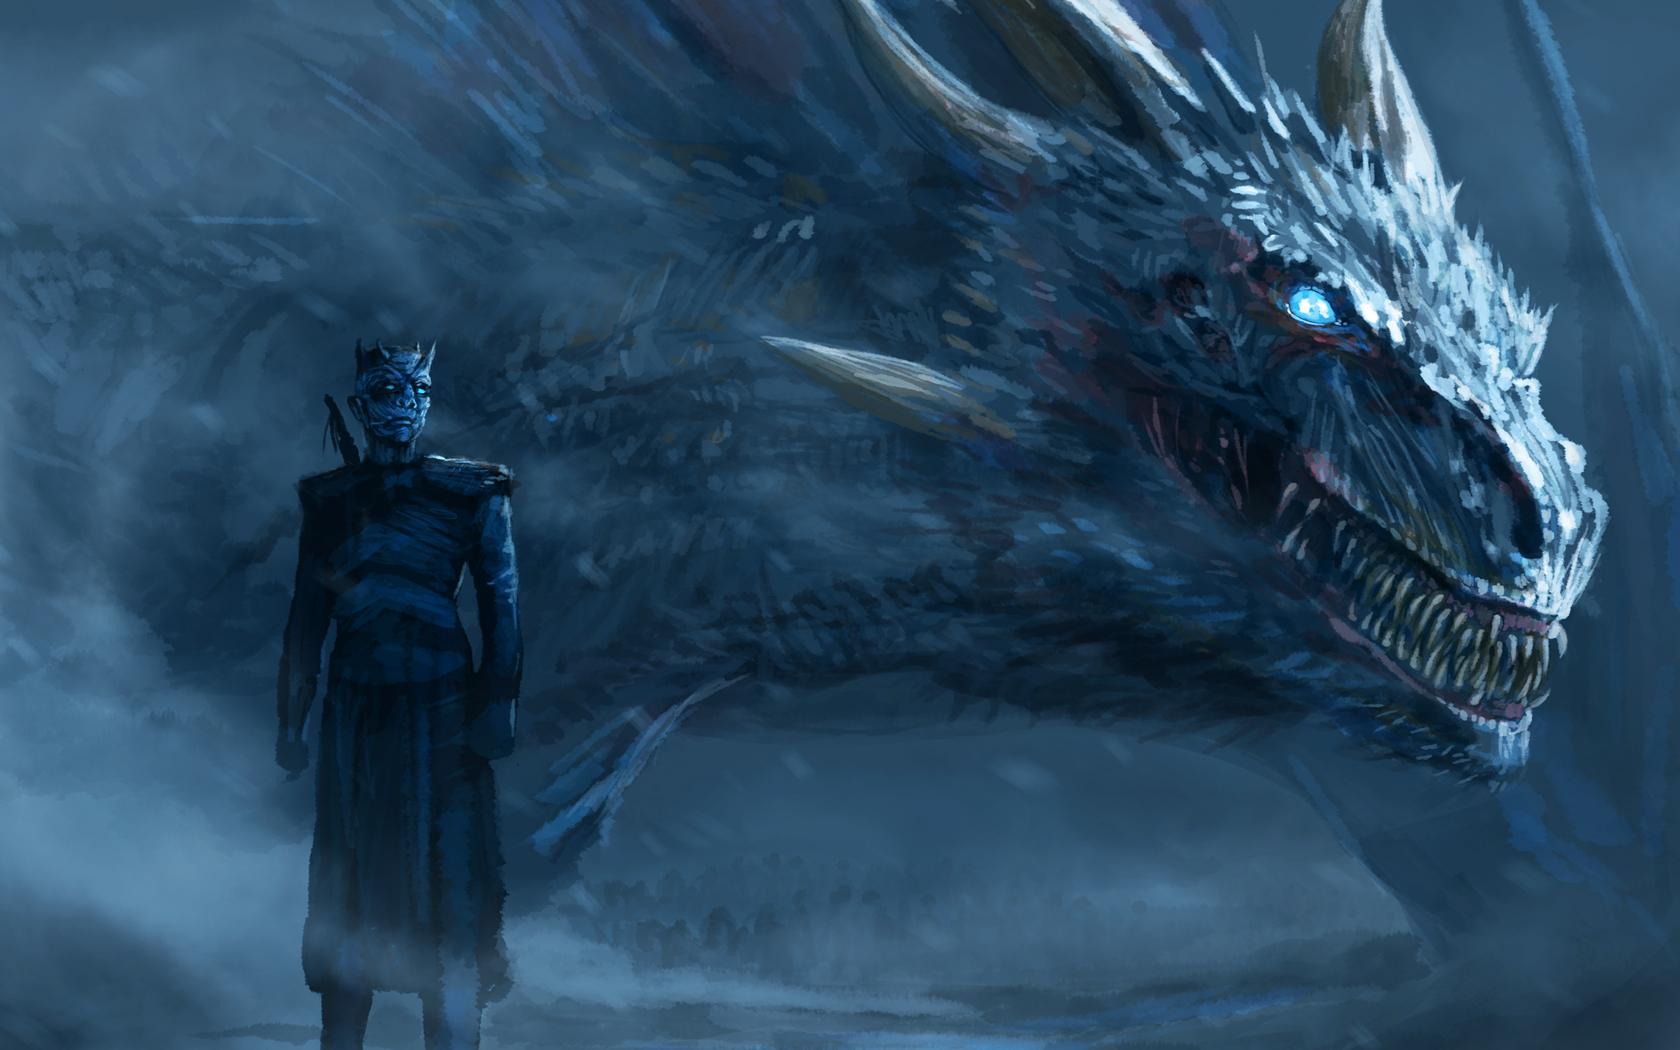 1680x1050 Playerunknowns Battlegrounds Artwork 1680x1050: 1680x1050 Night King Blue Eyes White Dragon 1680x1050